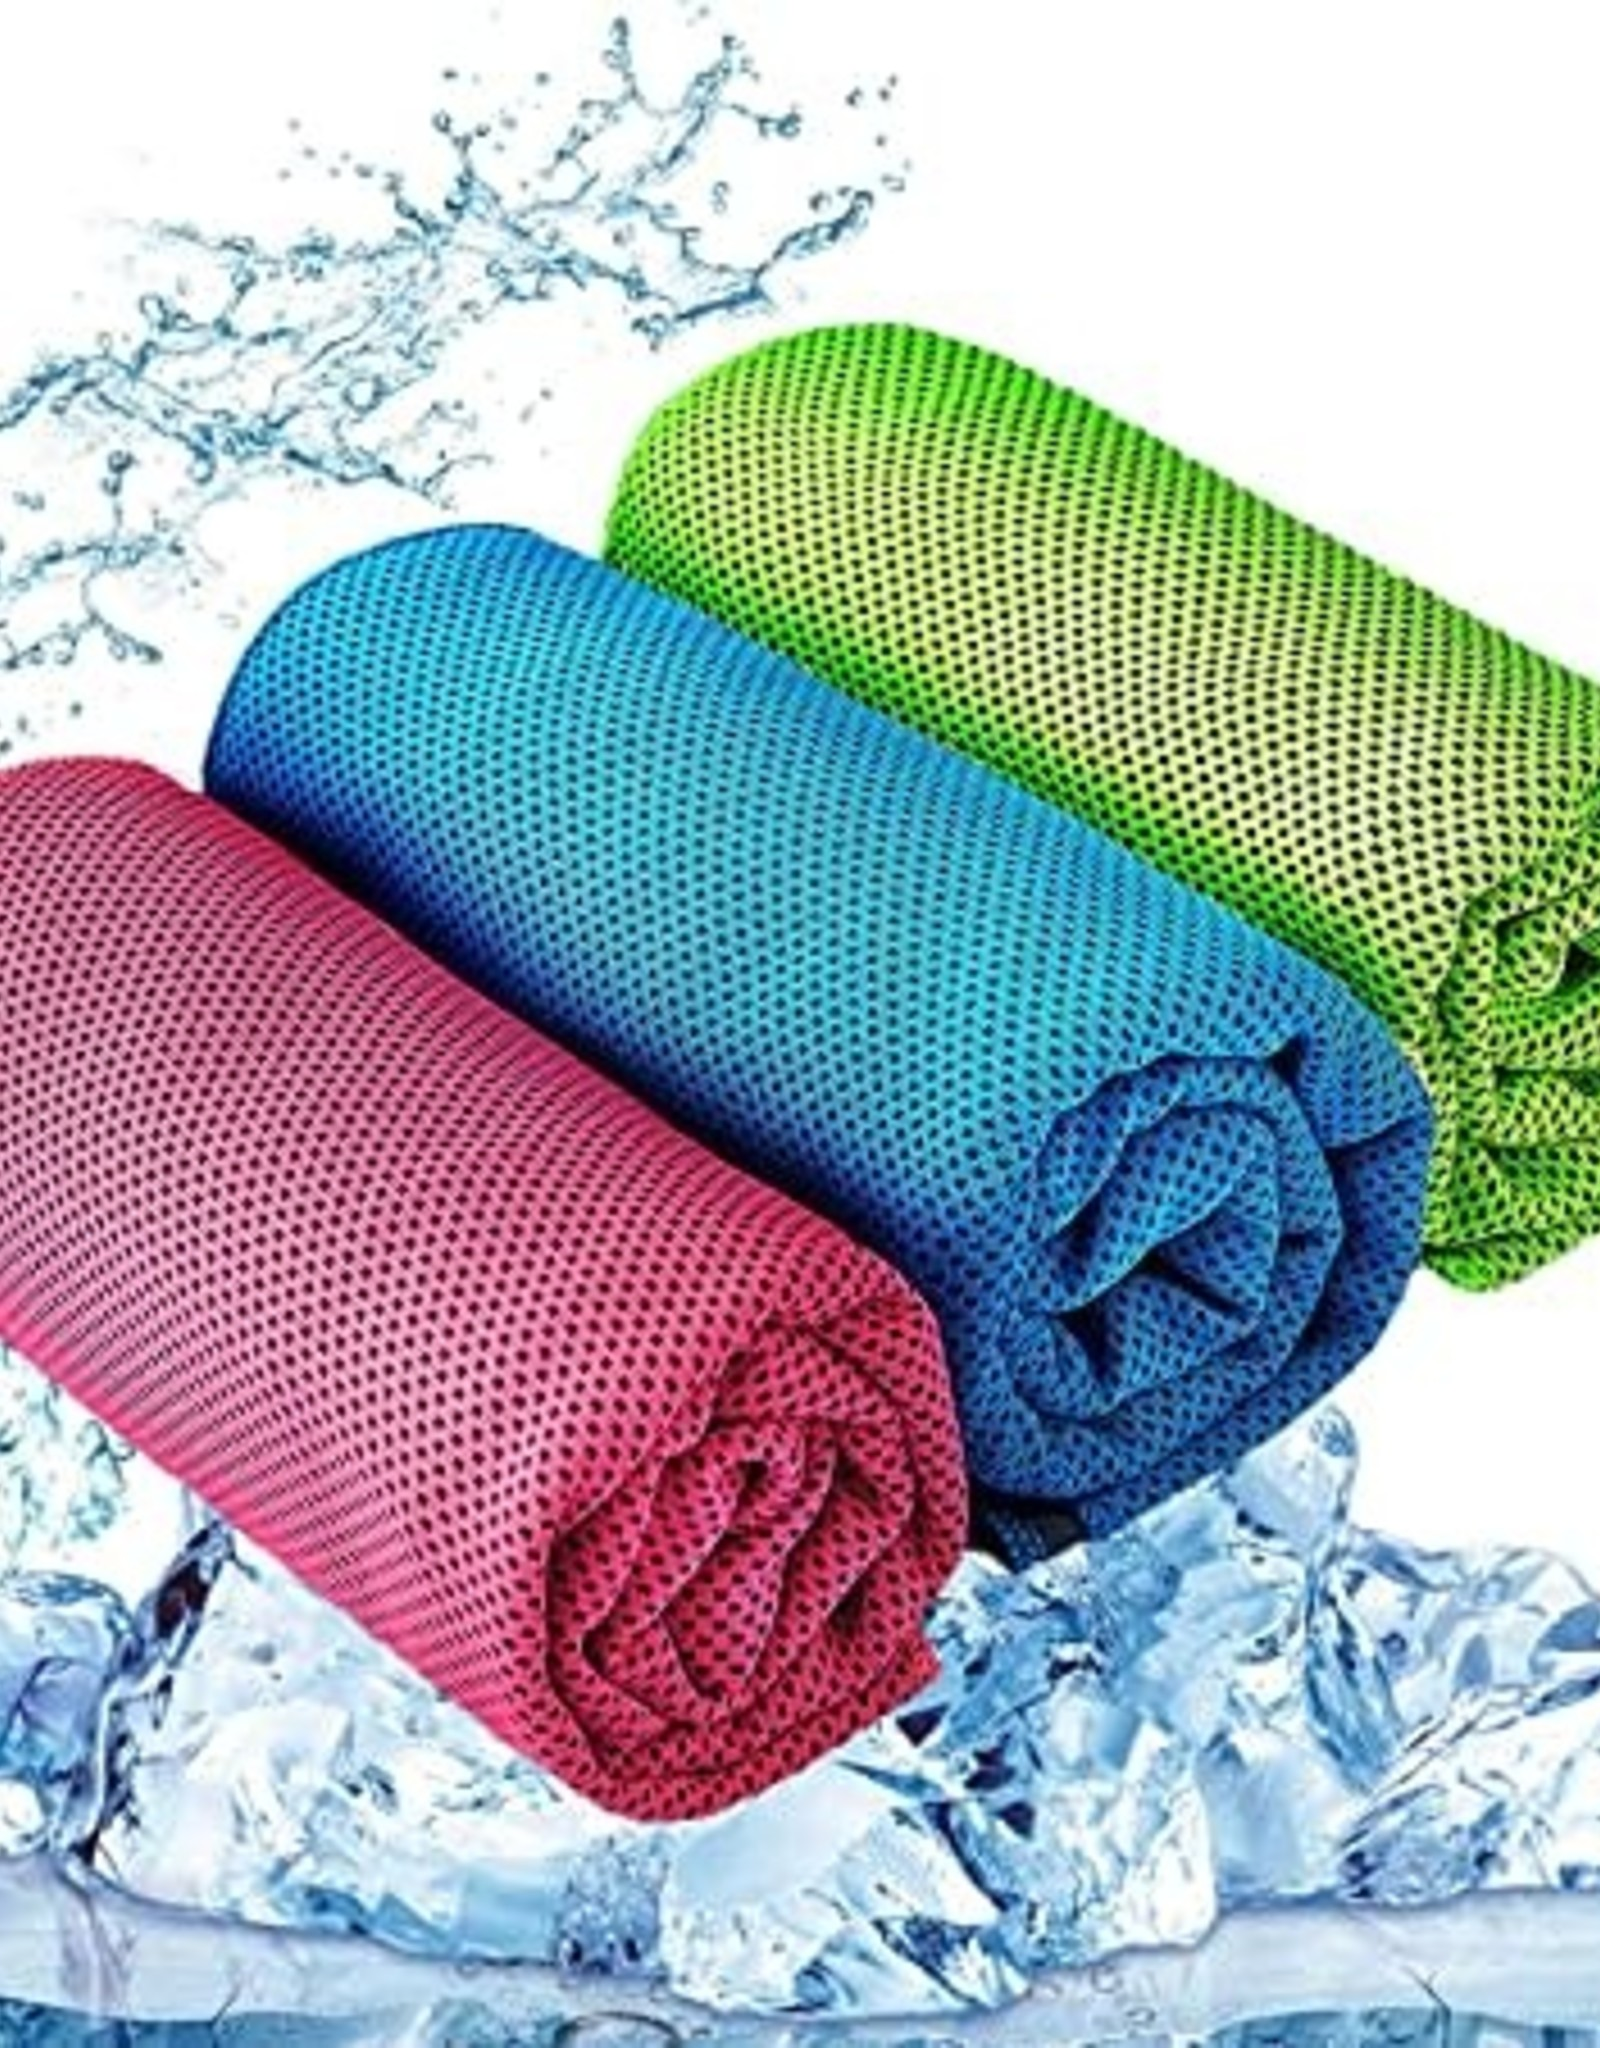 pictet-fino Pictet - Fino Cooling Towels 90*30cm